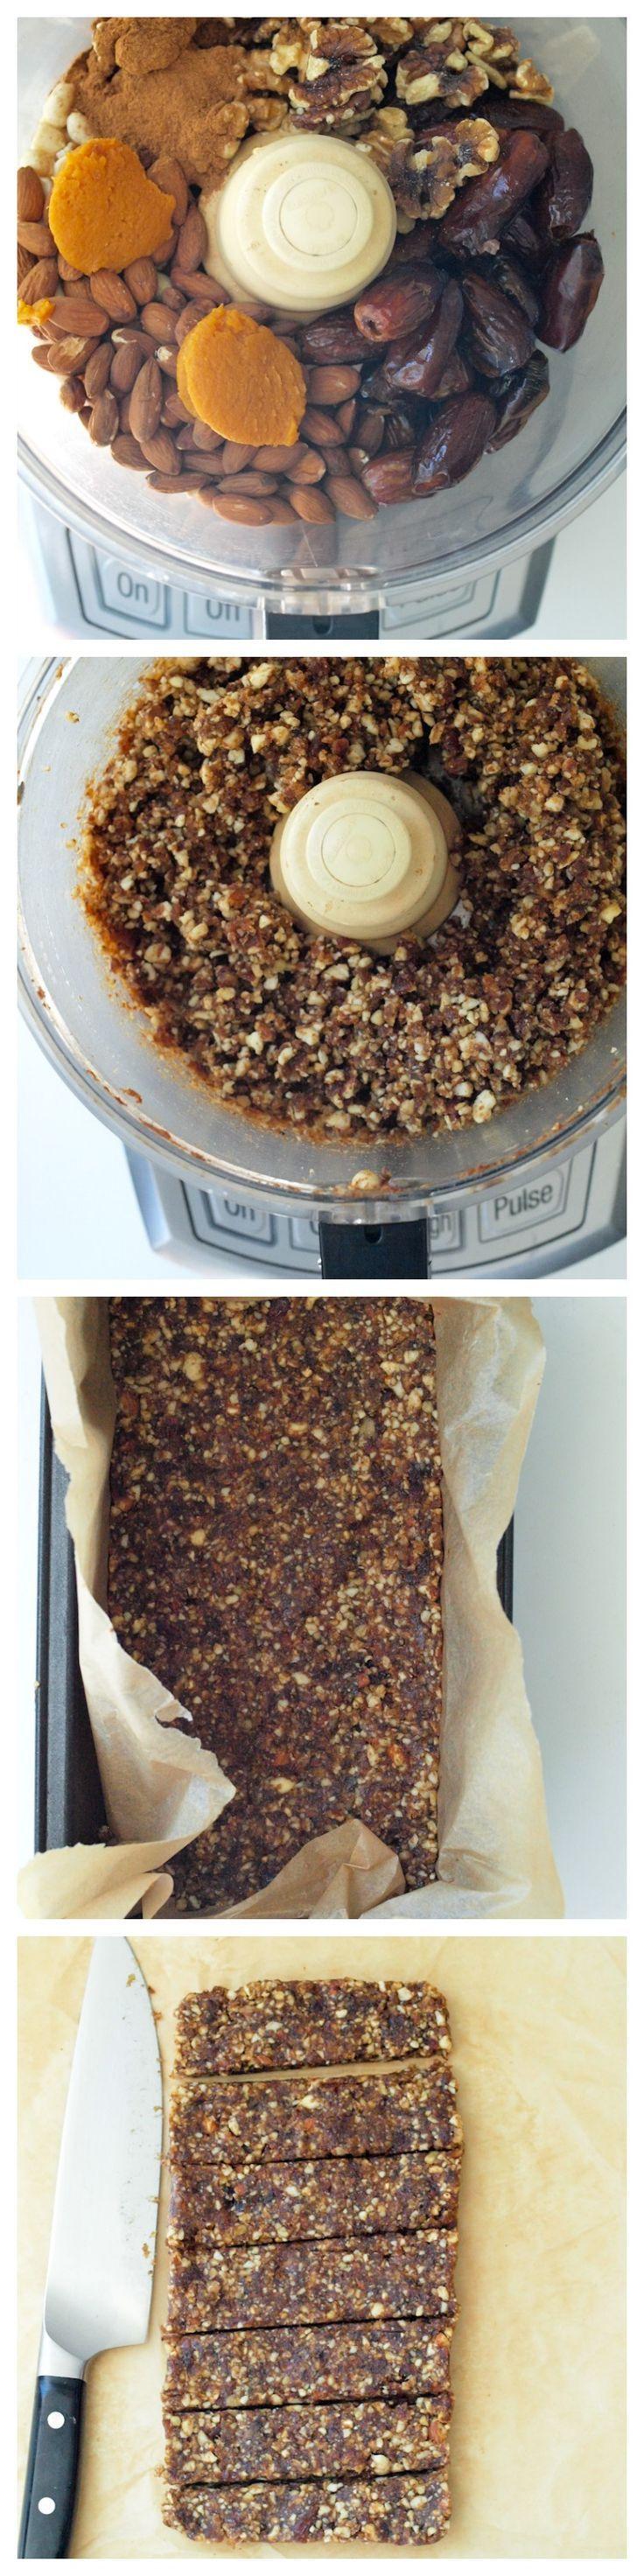 Pumpkin Spice Energy Bars.  Quick, easy, and healthy no bake snack recipe.